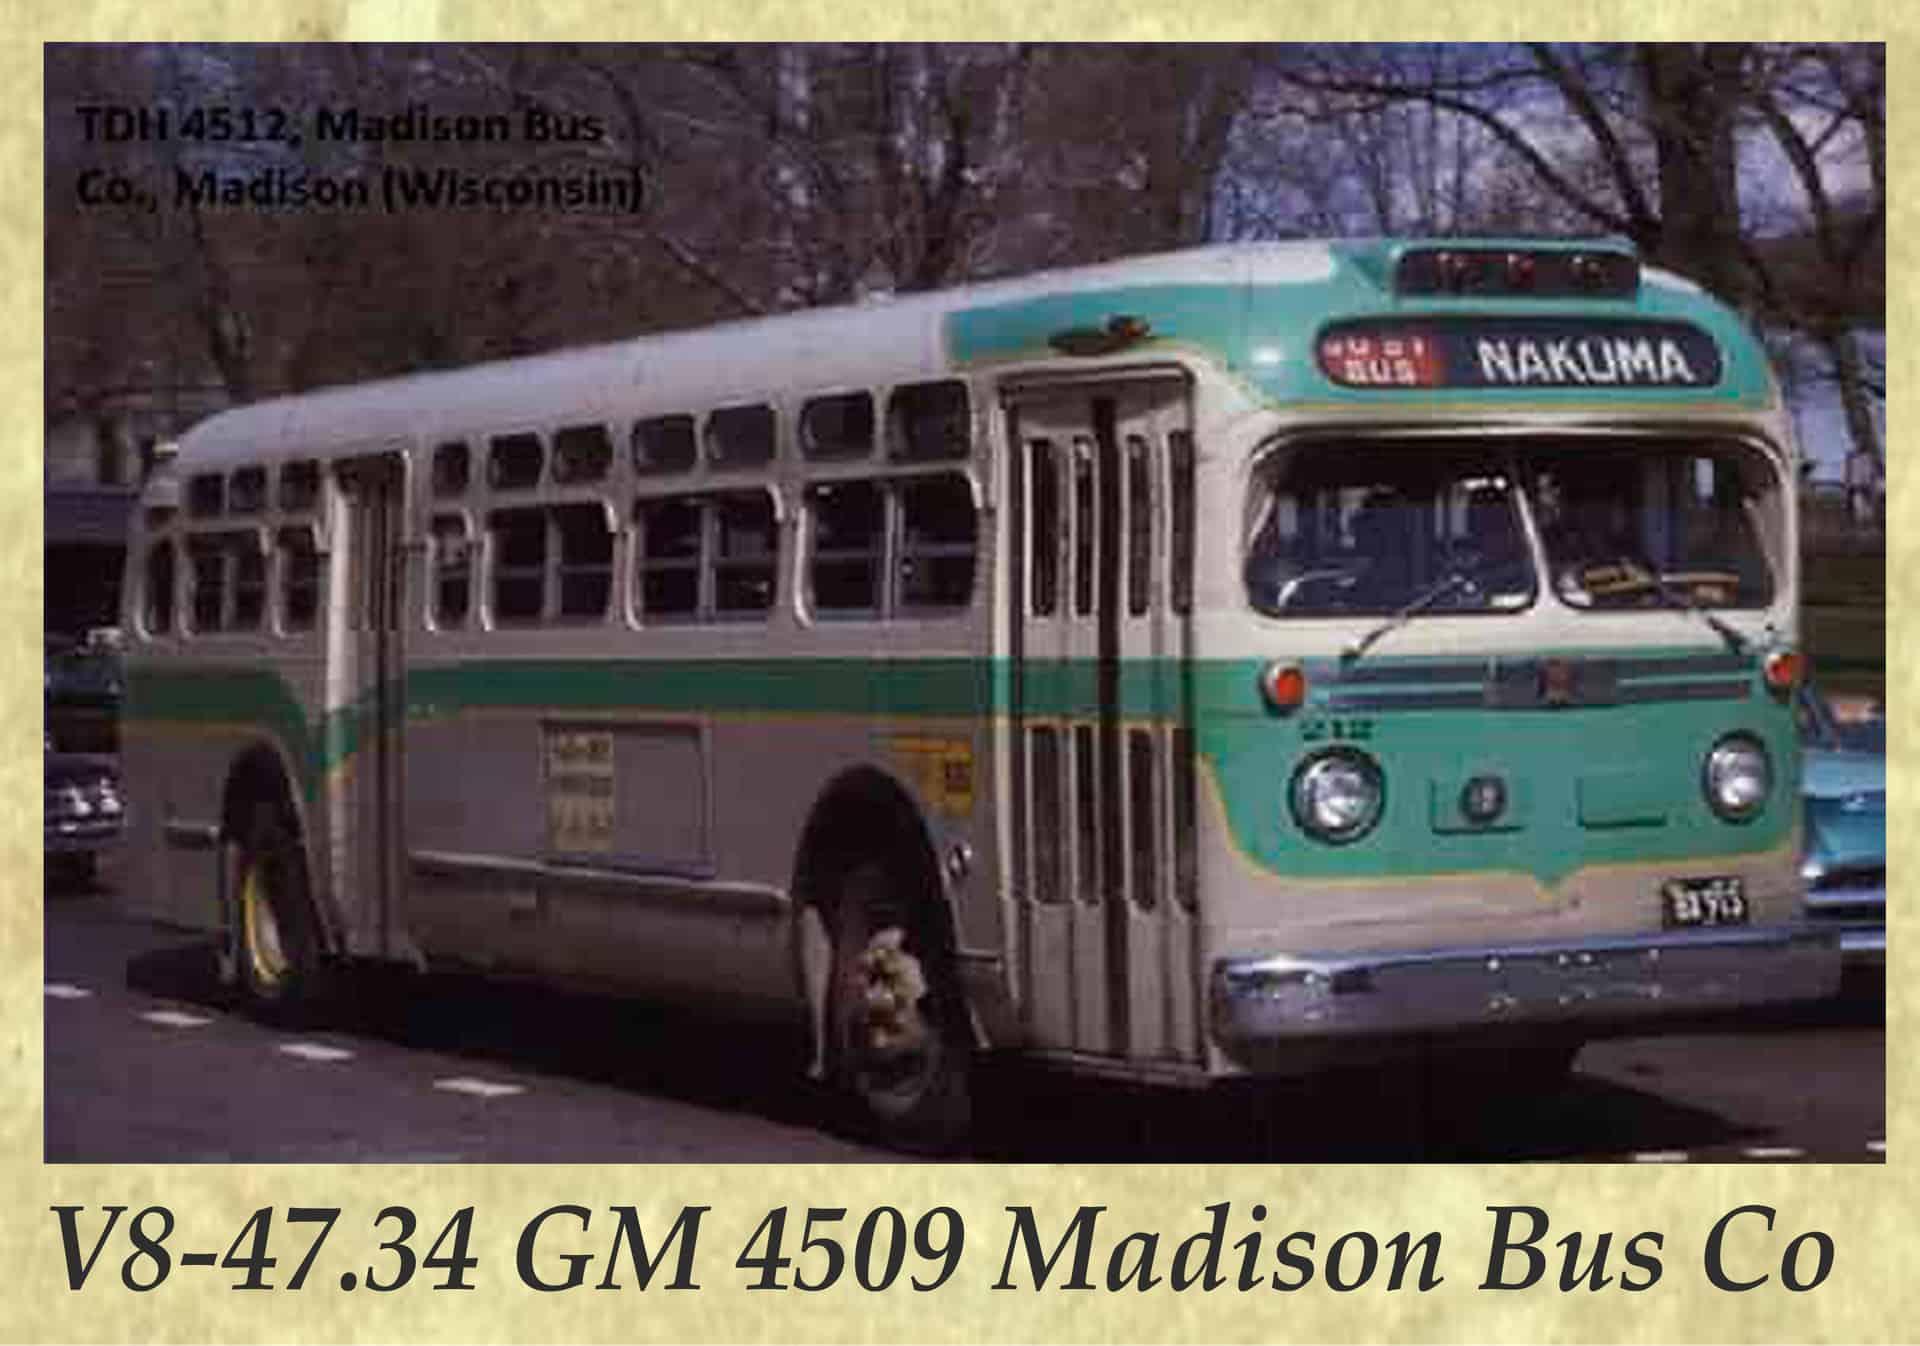 V8-47.34 GM 4509 Madison Bus Co